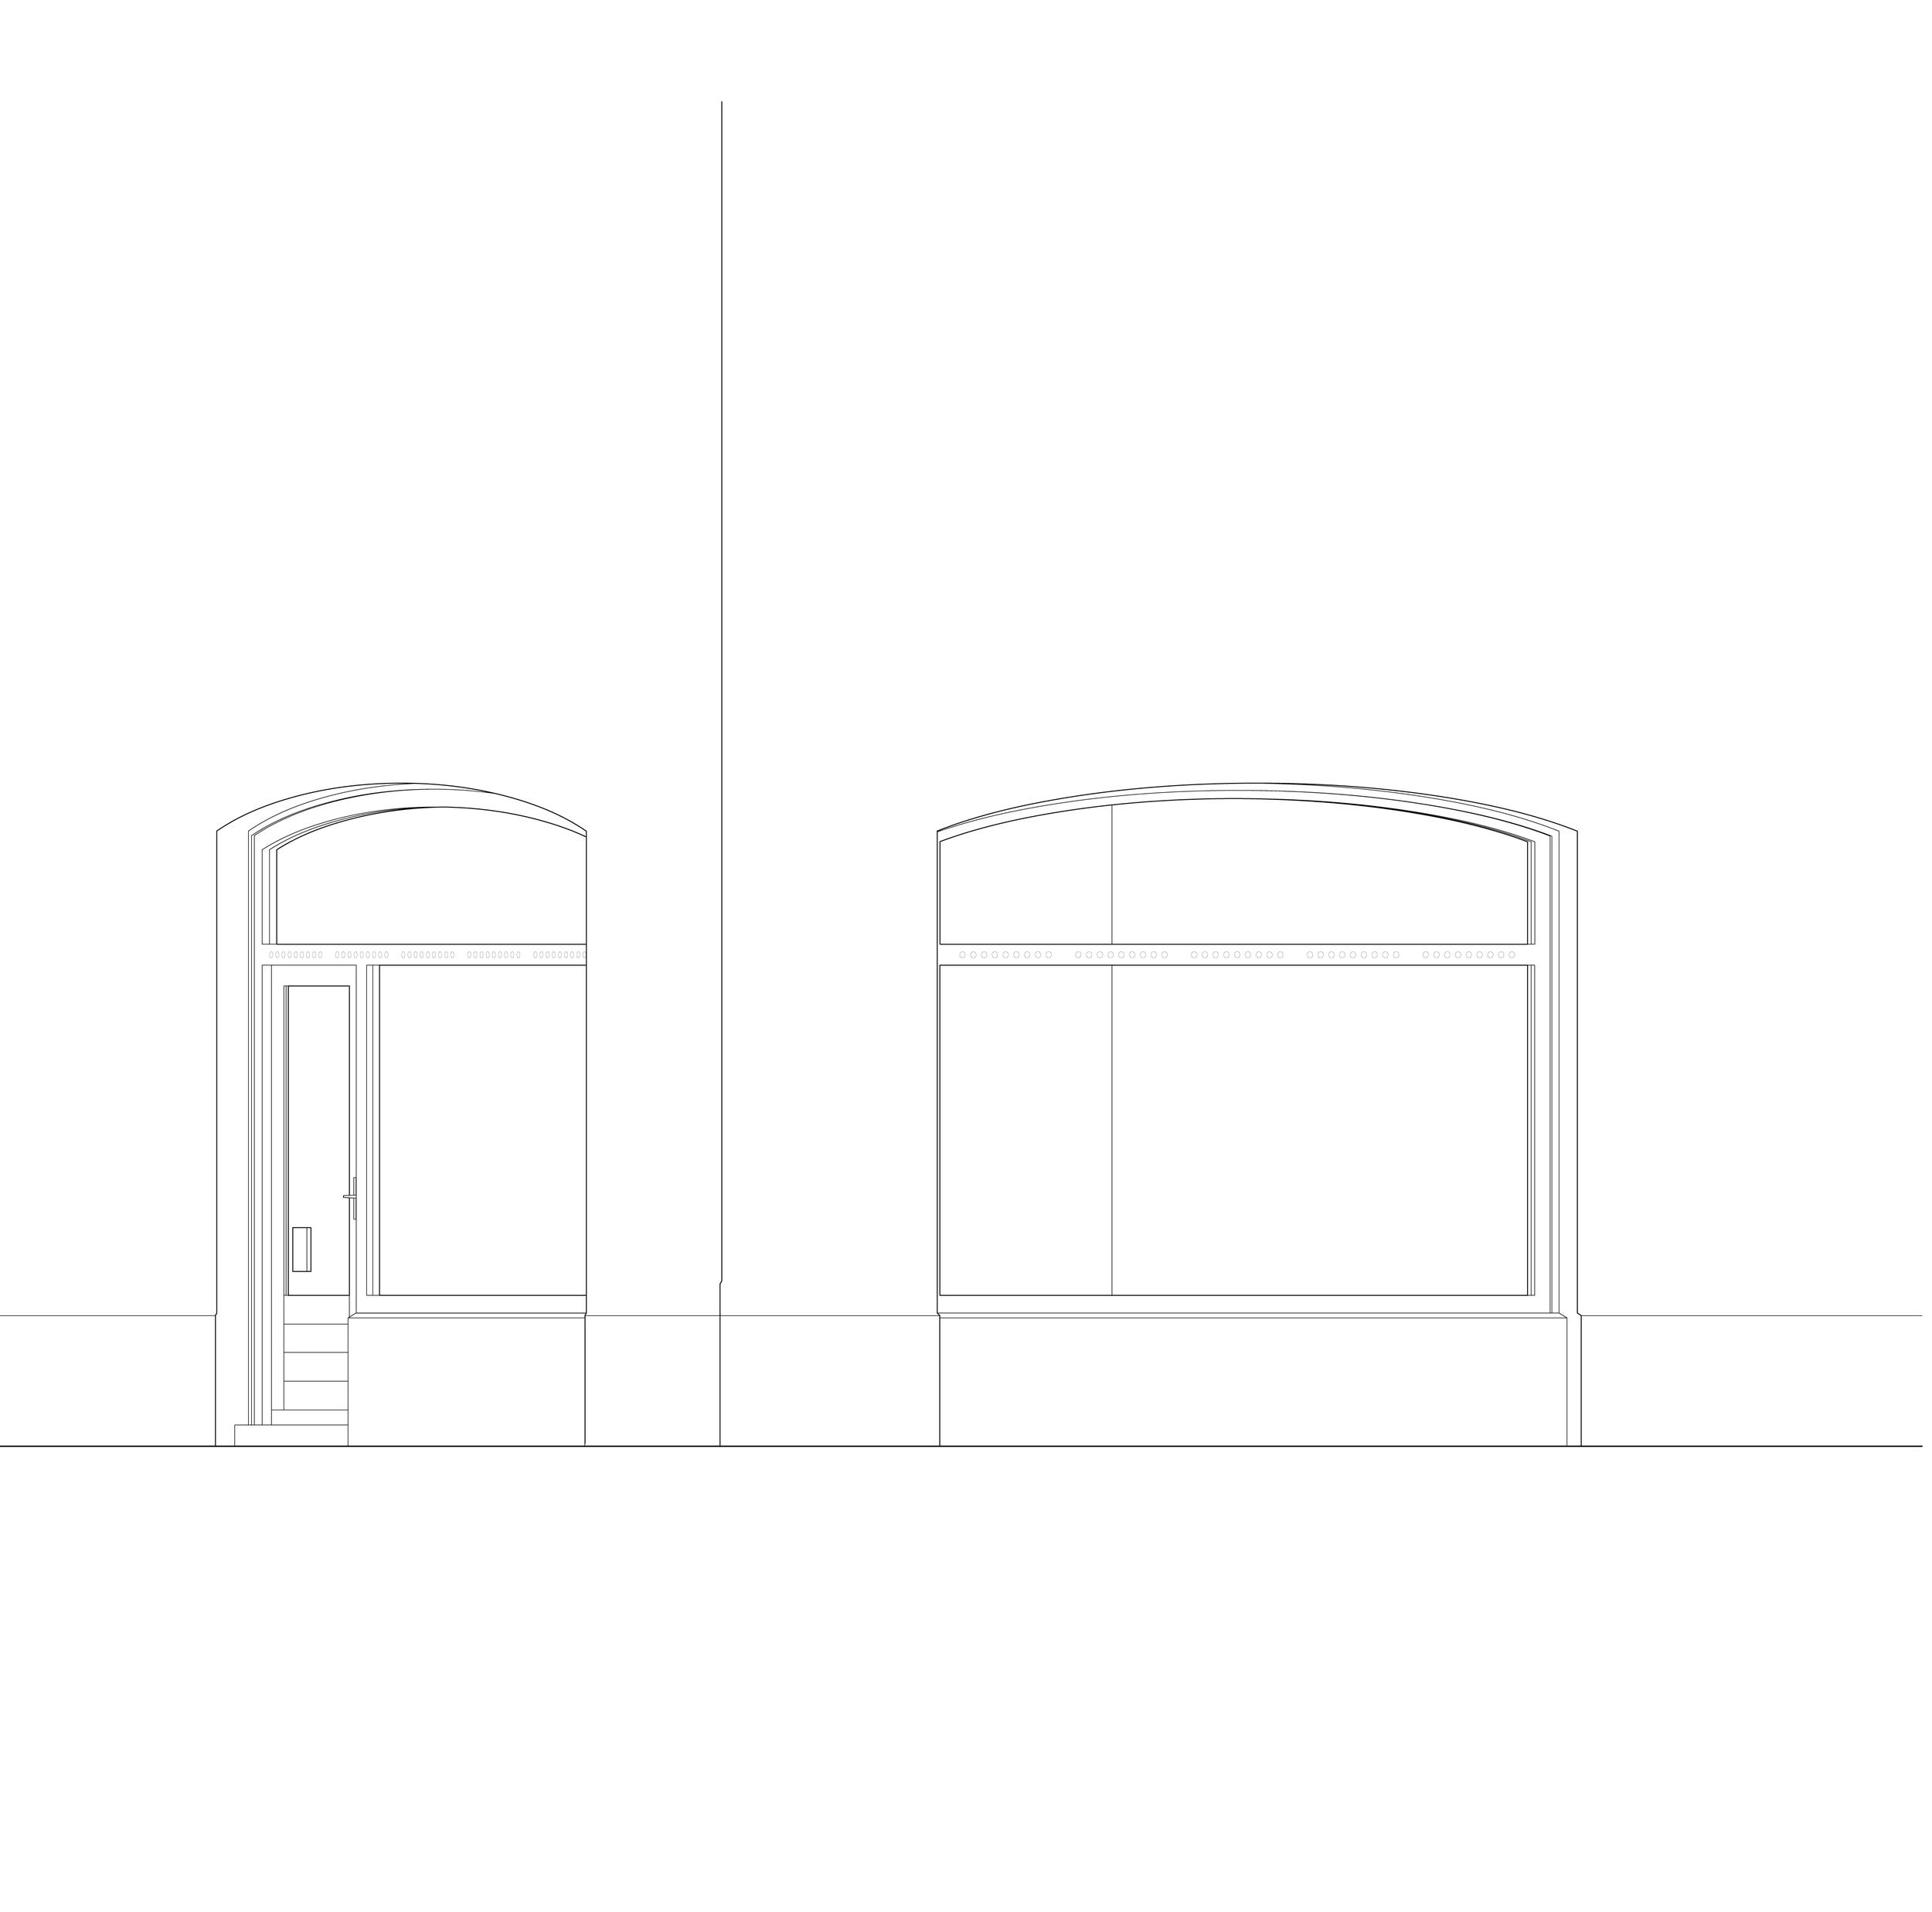 Grundriss detail 4.jpg